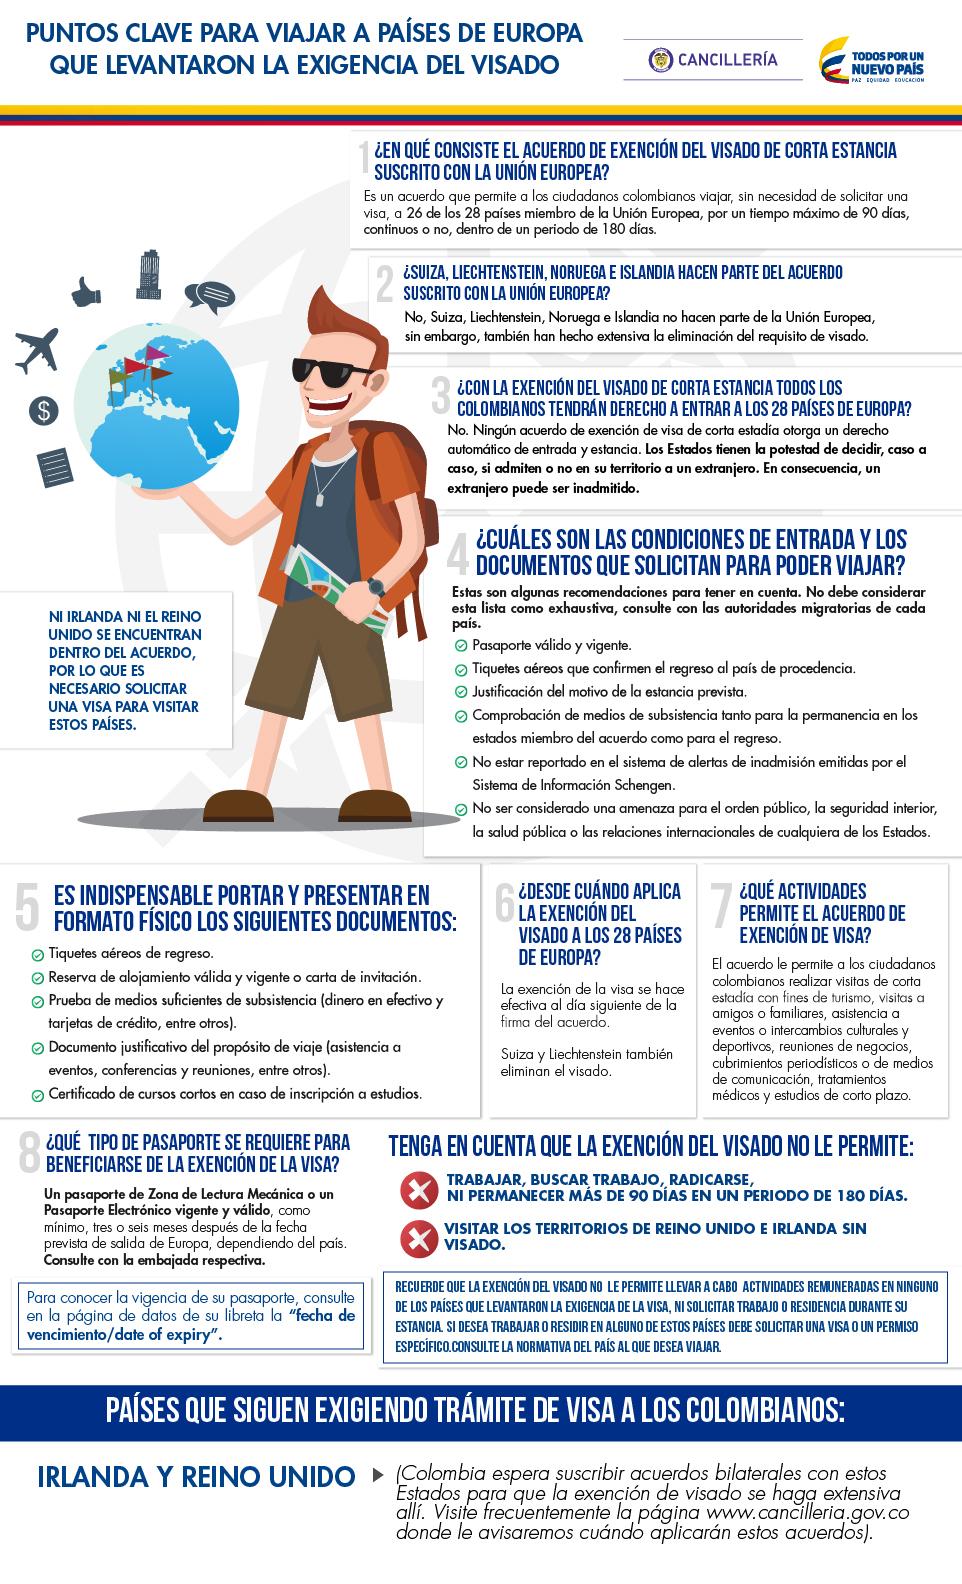 Requisitos para viajar a españa como turista desde chile